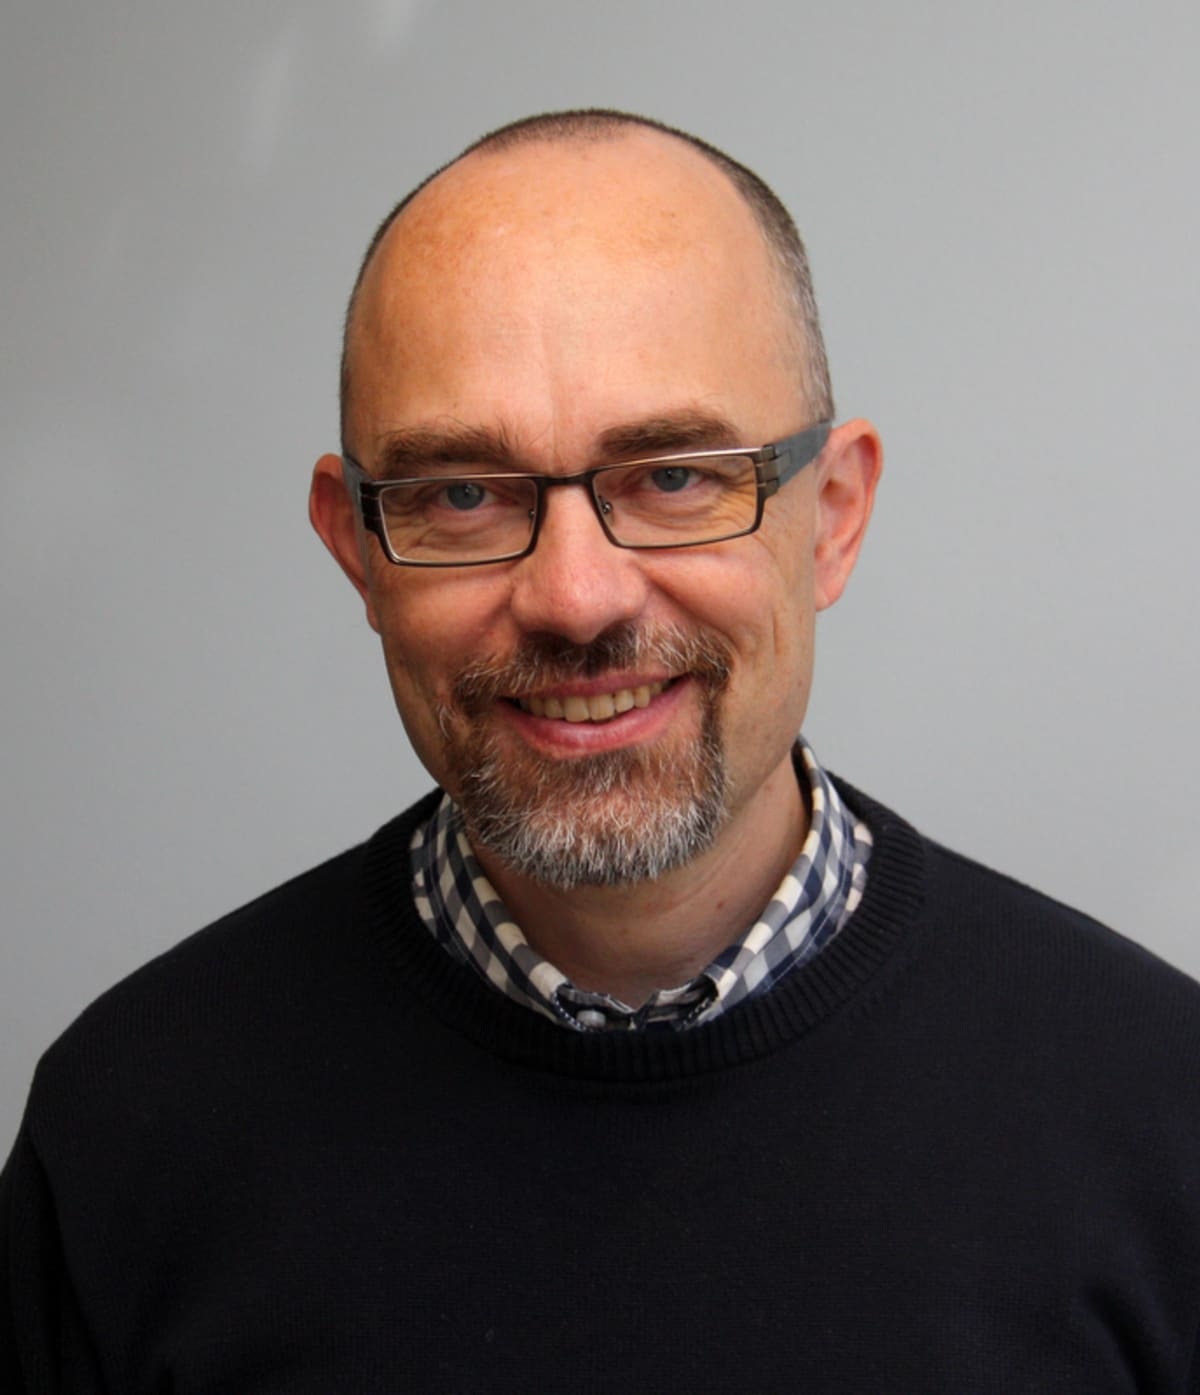 Juha Korpijärvi